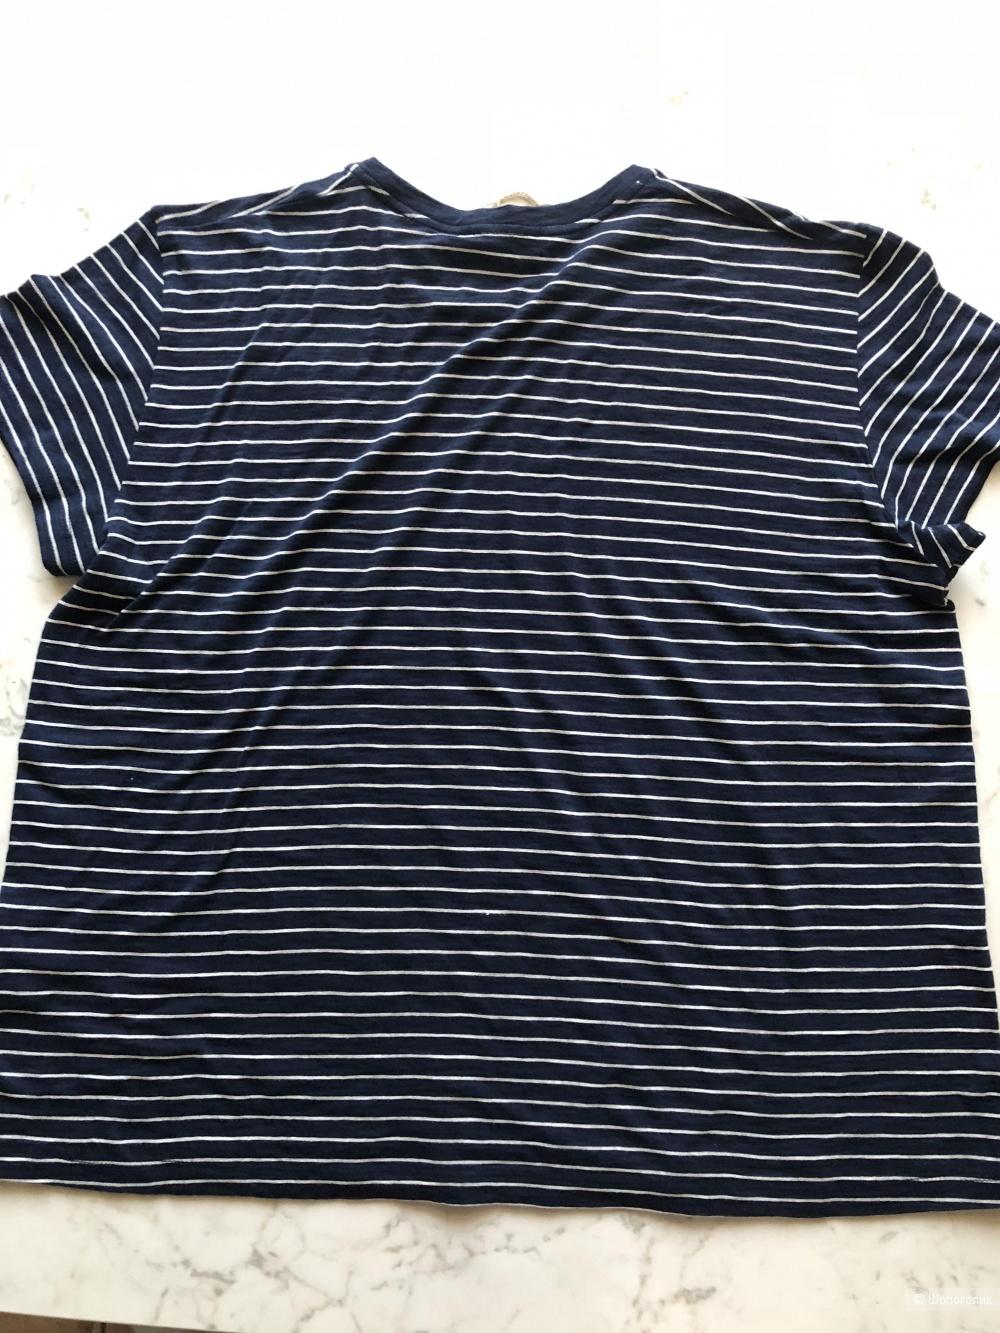 Vince футболка , размер М